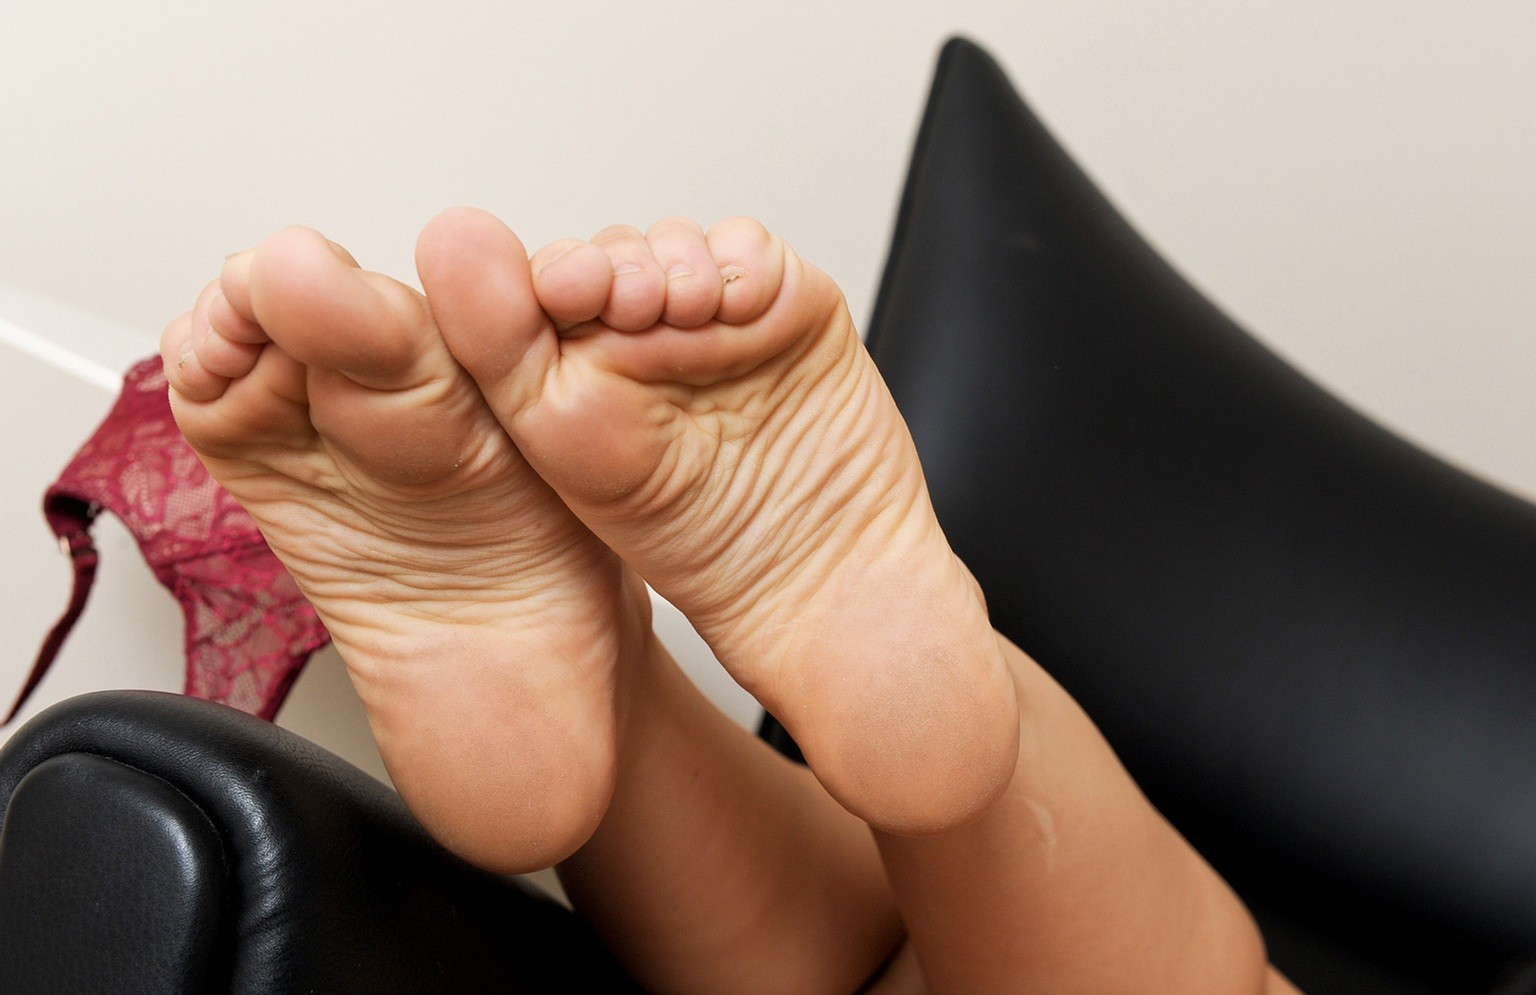 madison ivy feet porn